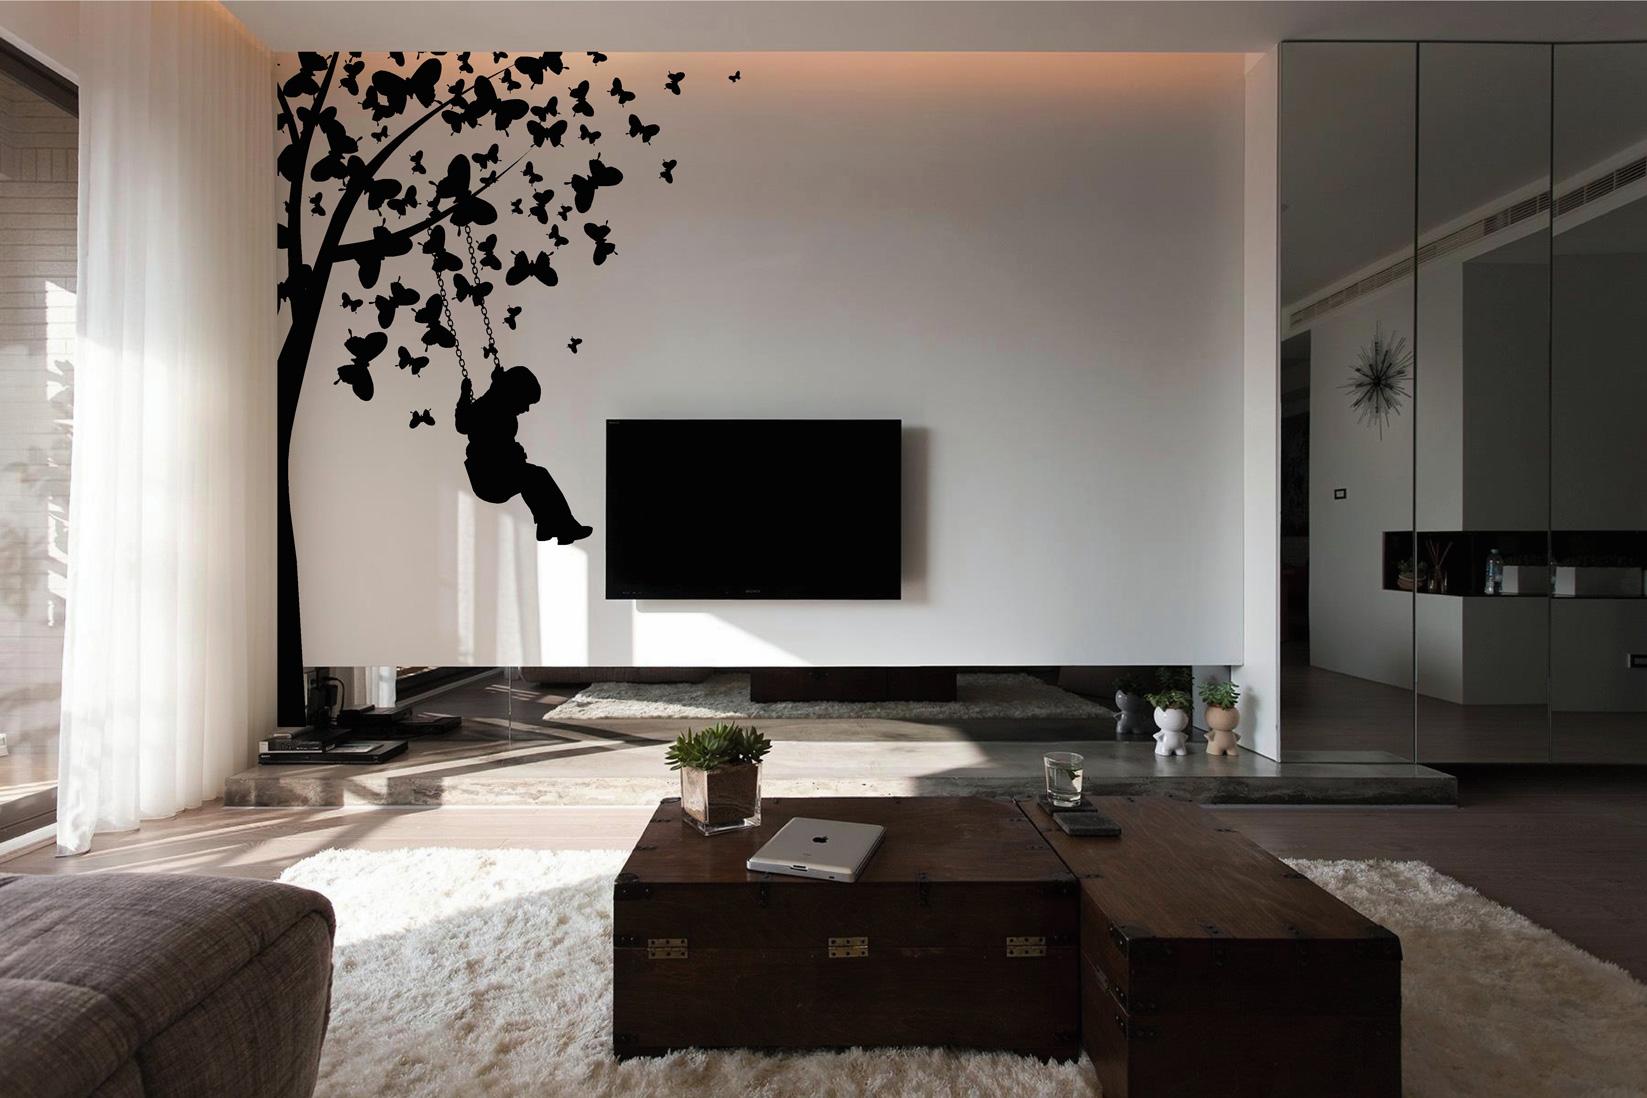 Muursticker (C), boom, schommel, vlinders, muur, groot, huiskamer, muursticker, zwart